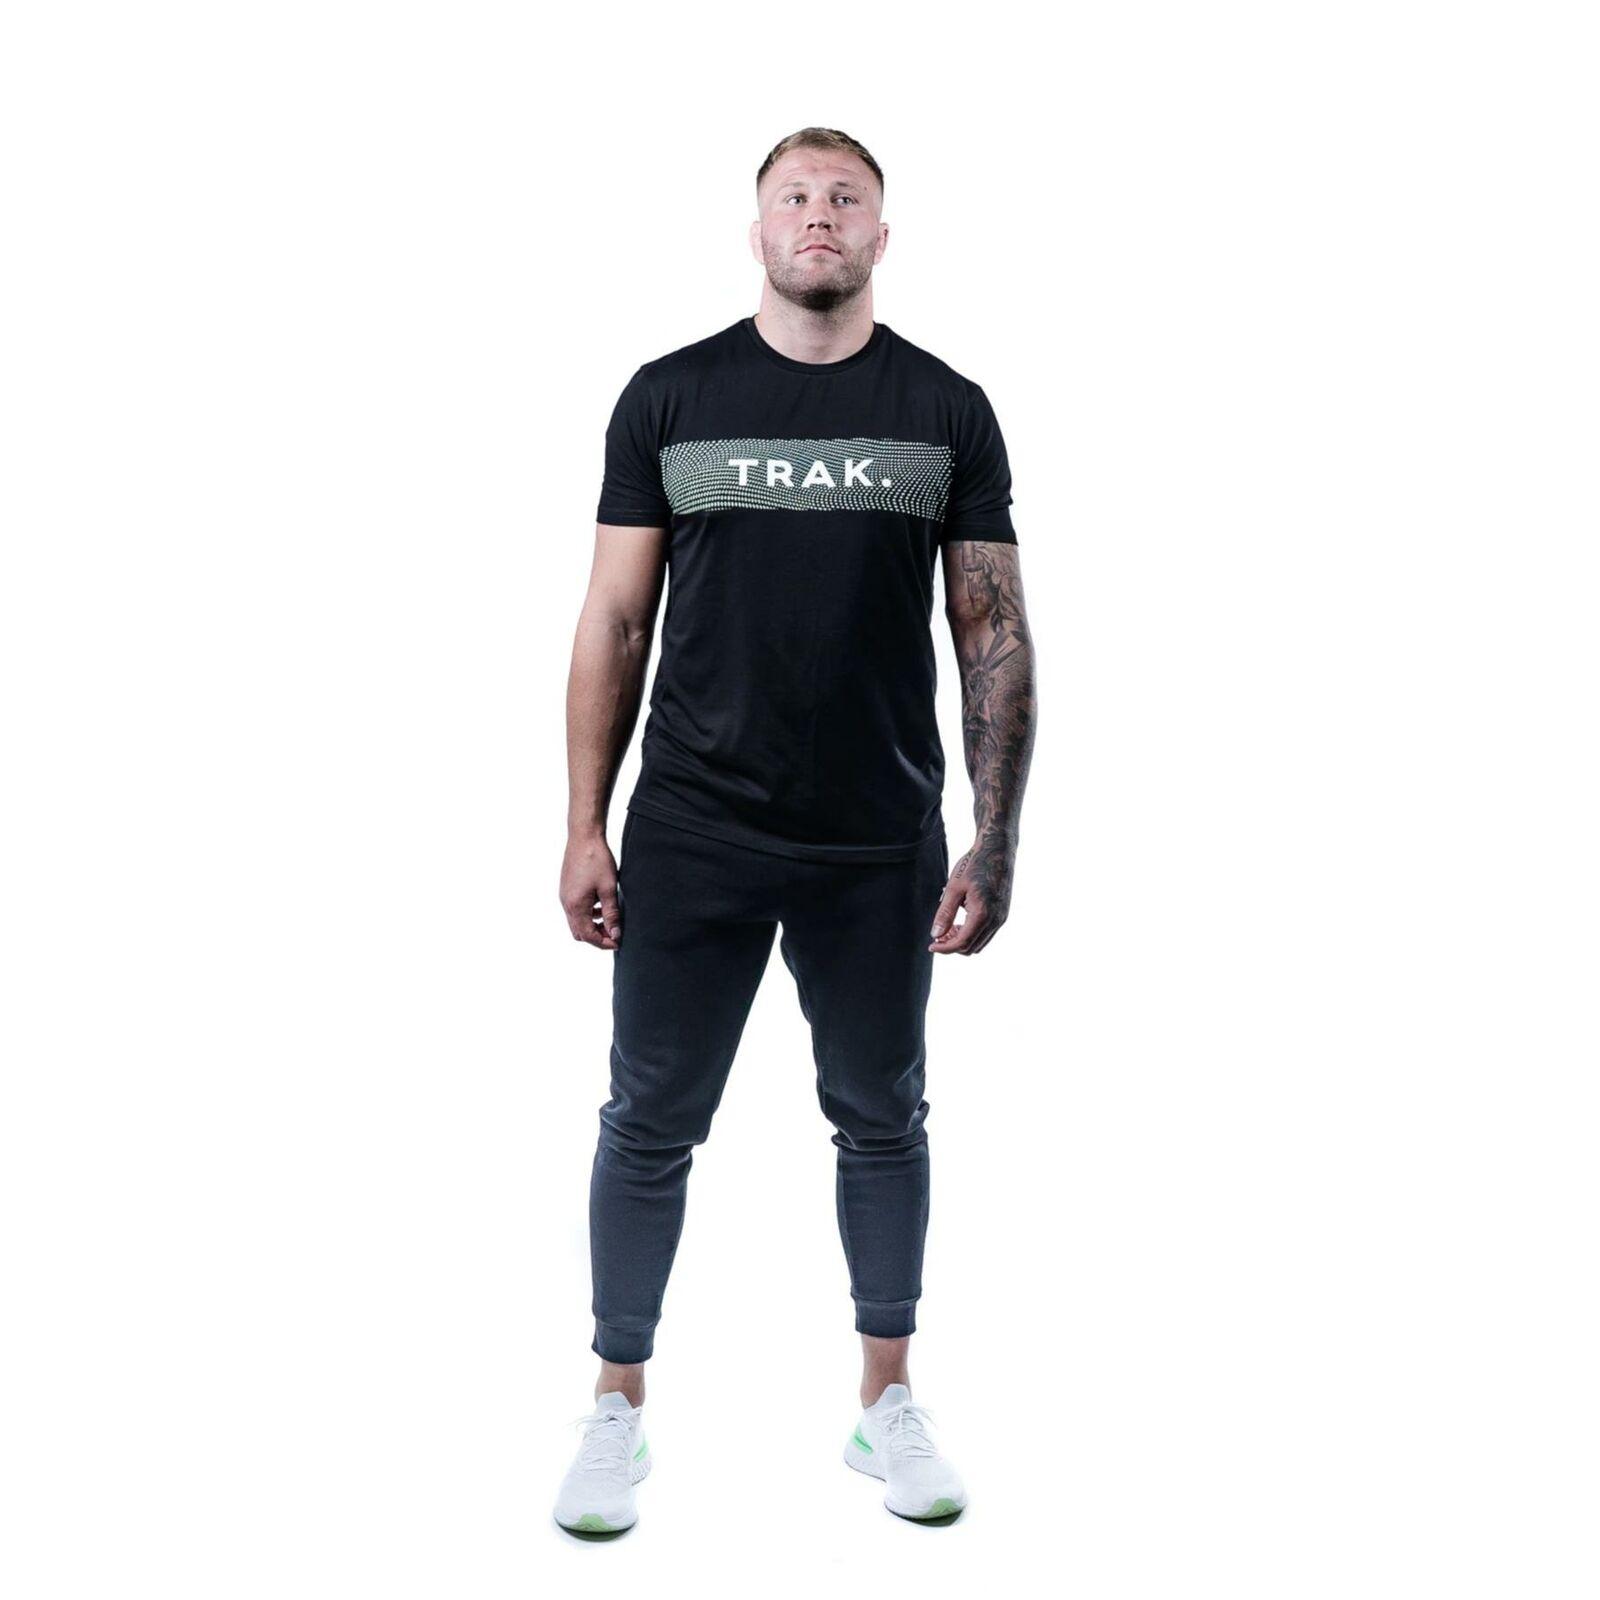 Trak Athletic Men's Carbon Print T-Shirt | Black